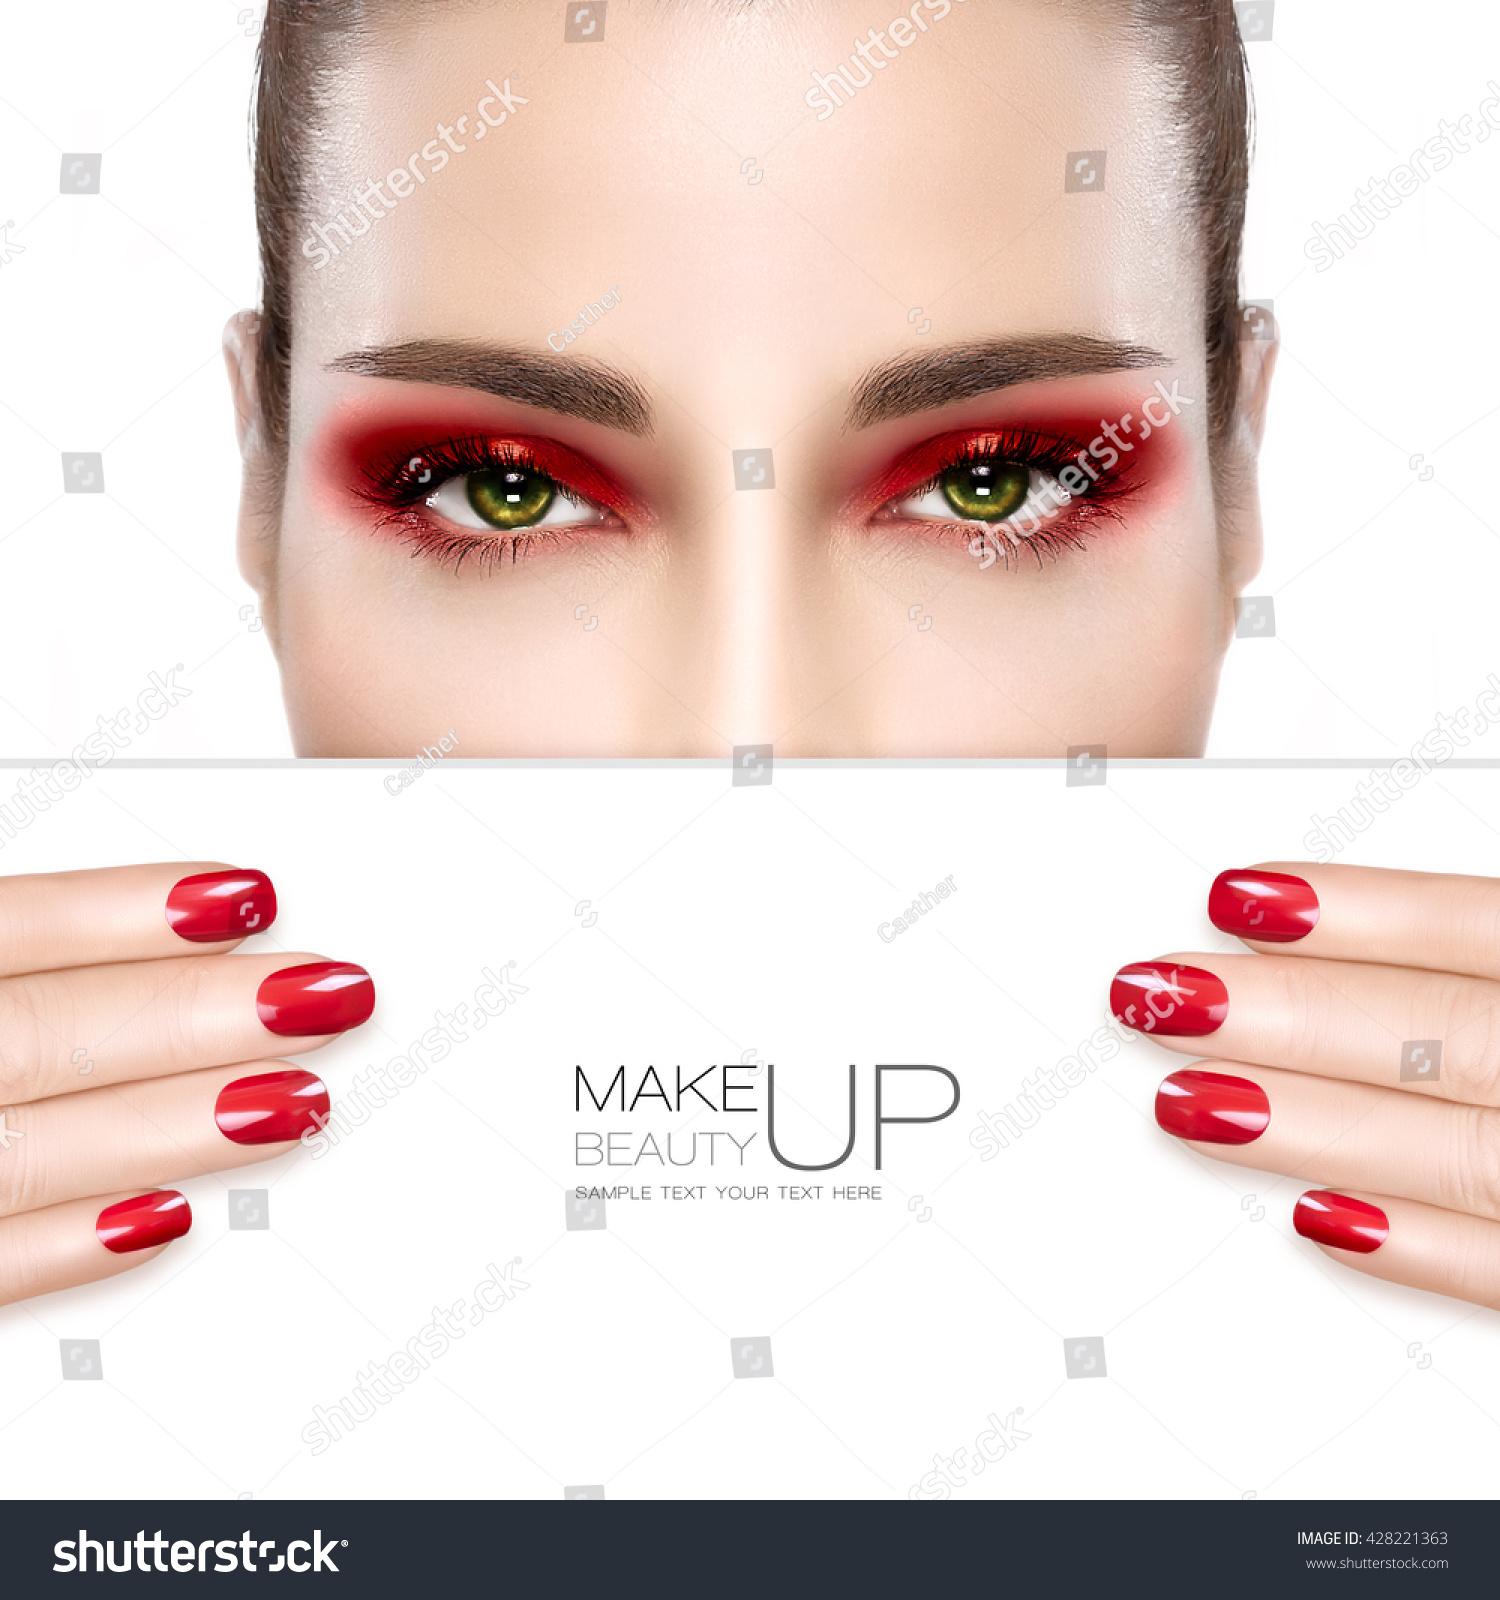 Beauty Makeup Nail Art Concept Beautiful Stock Photo (Royalty Free ...